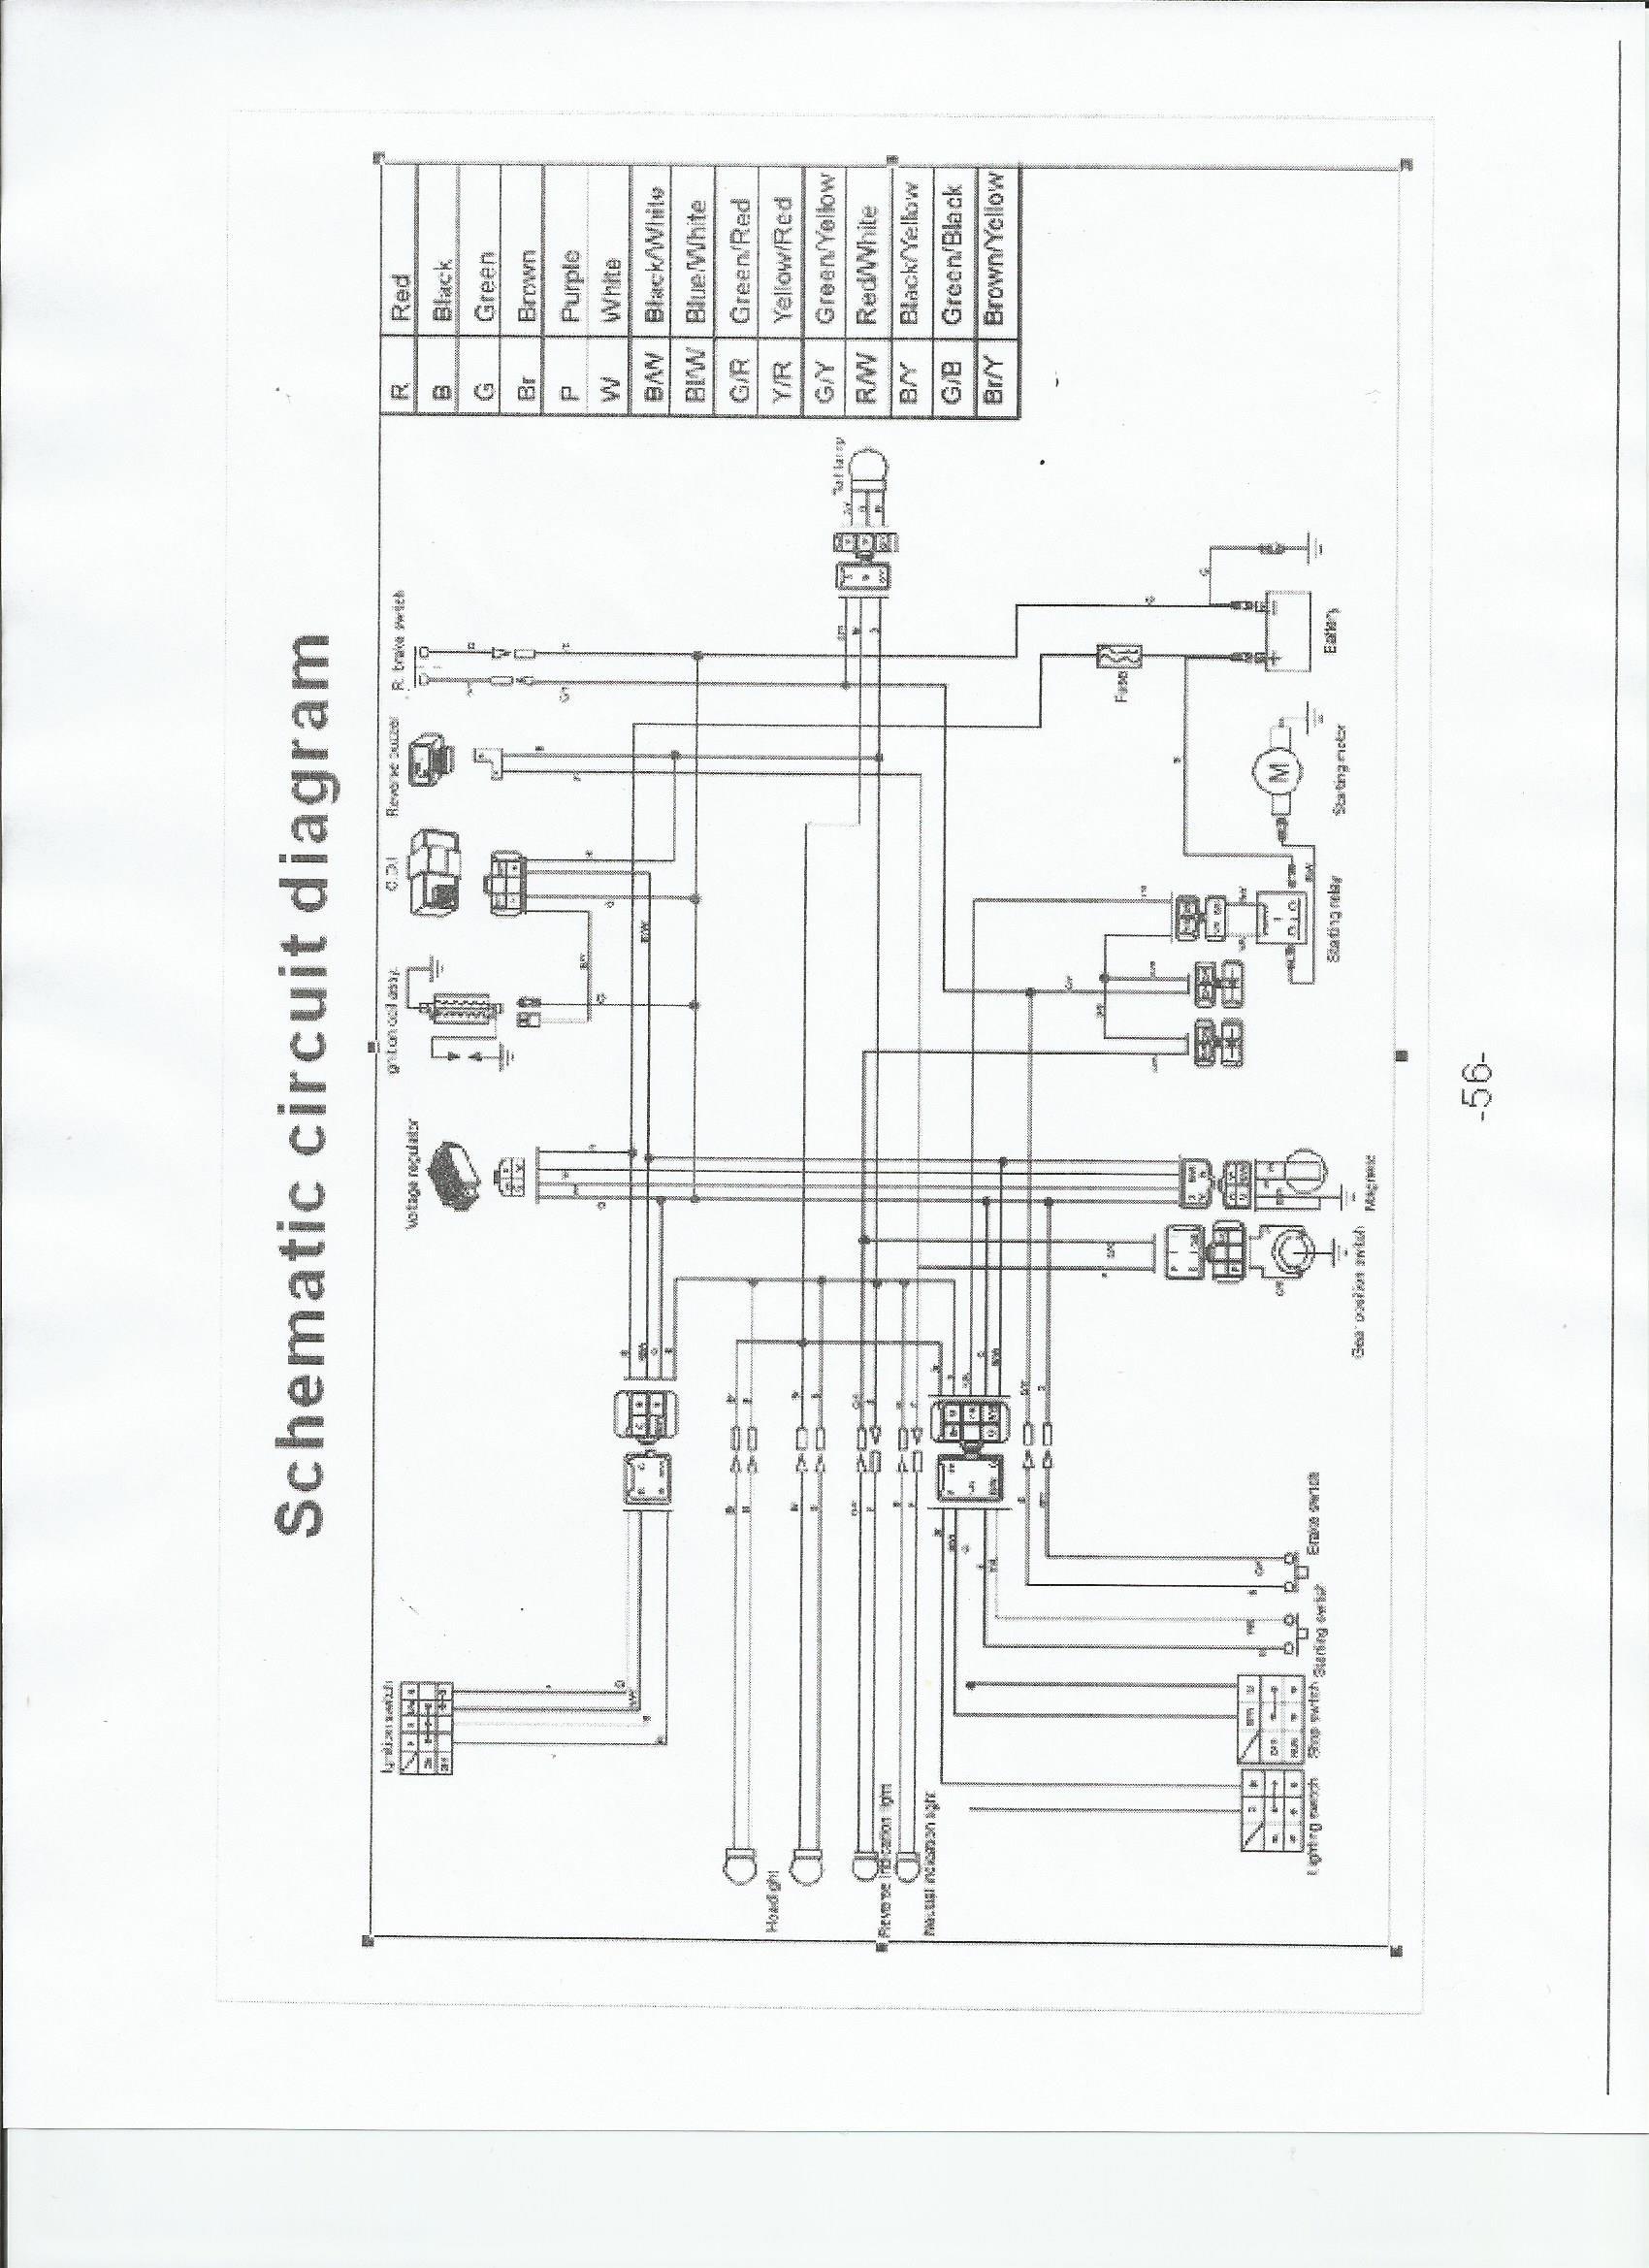 Pleasing Kazuma Go Kart Wiring Diagram Today Diagram Data Schema Wiring Cloud Genionhyedimohammedshrineorg